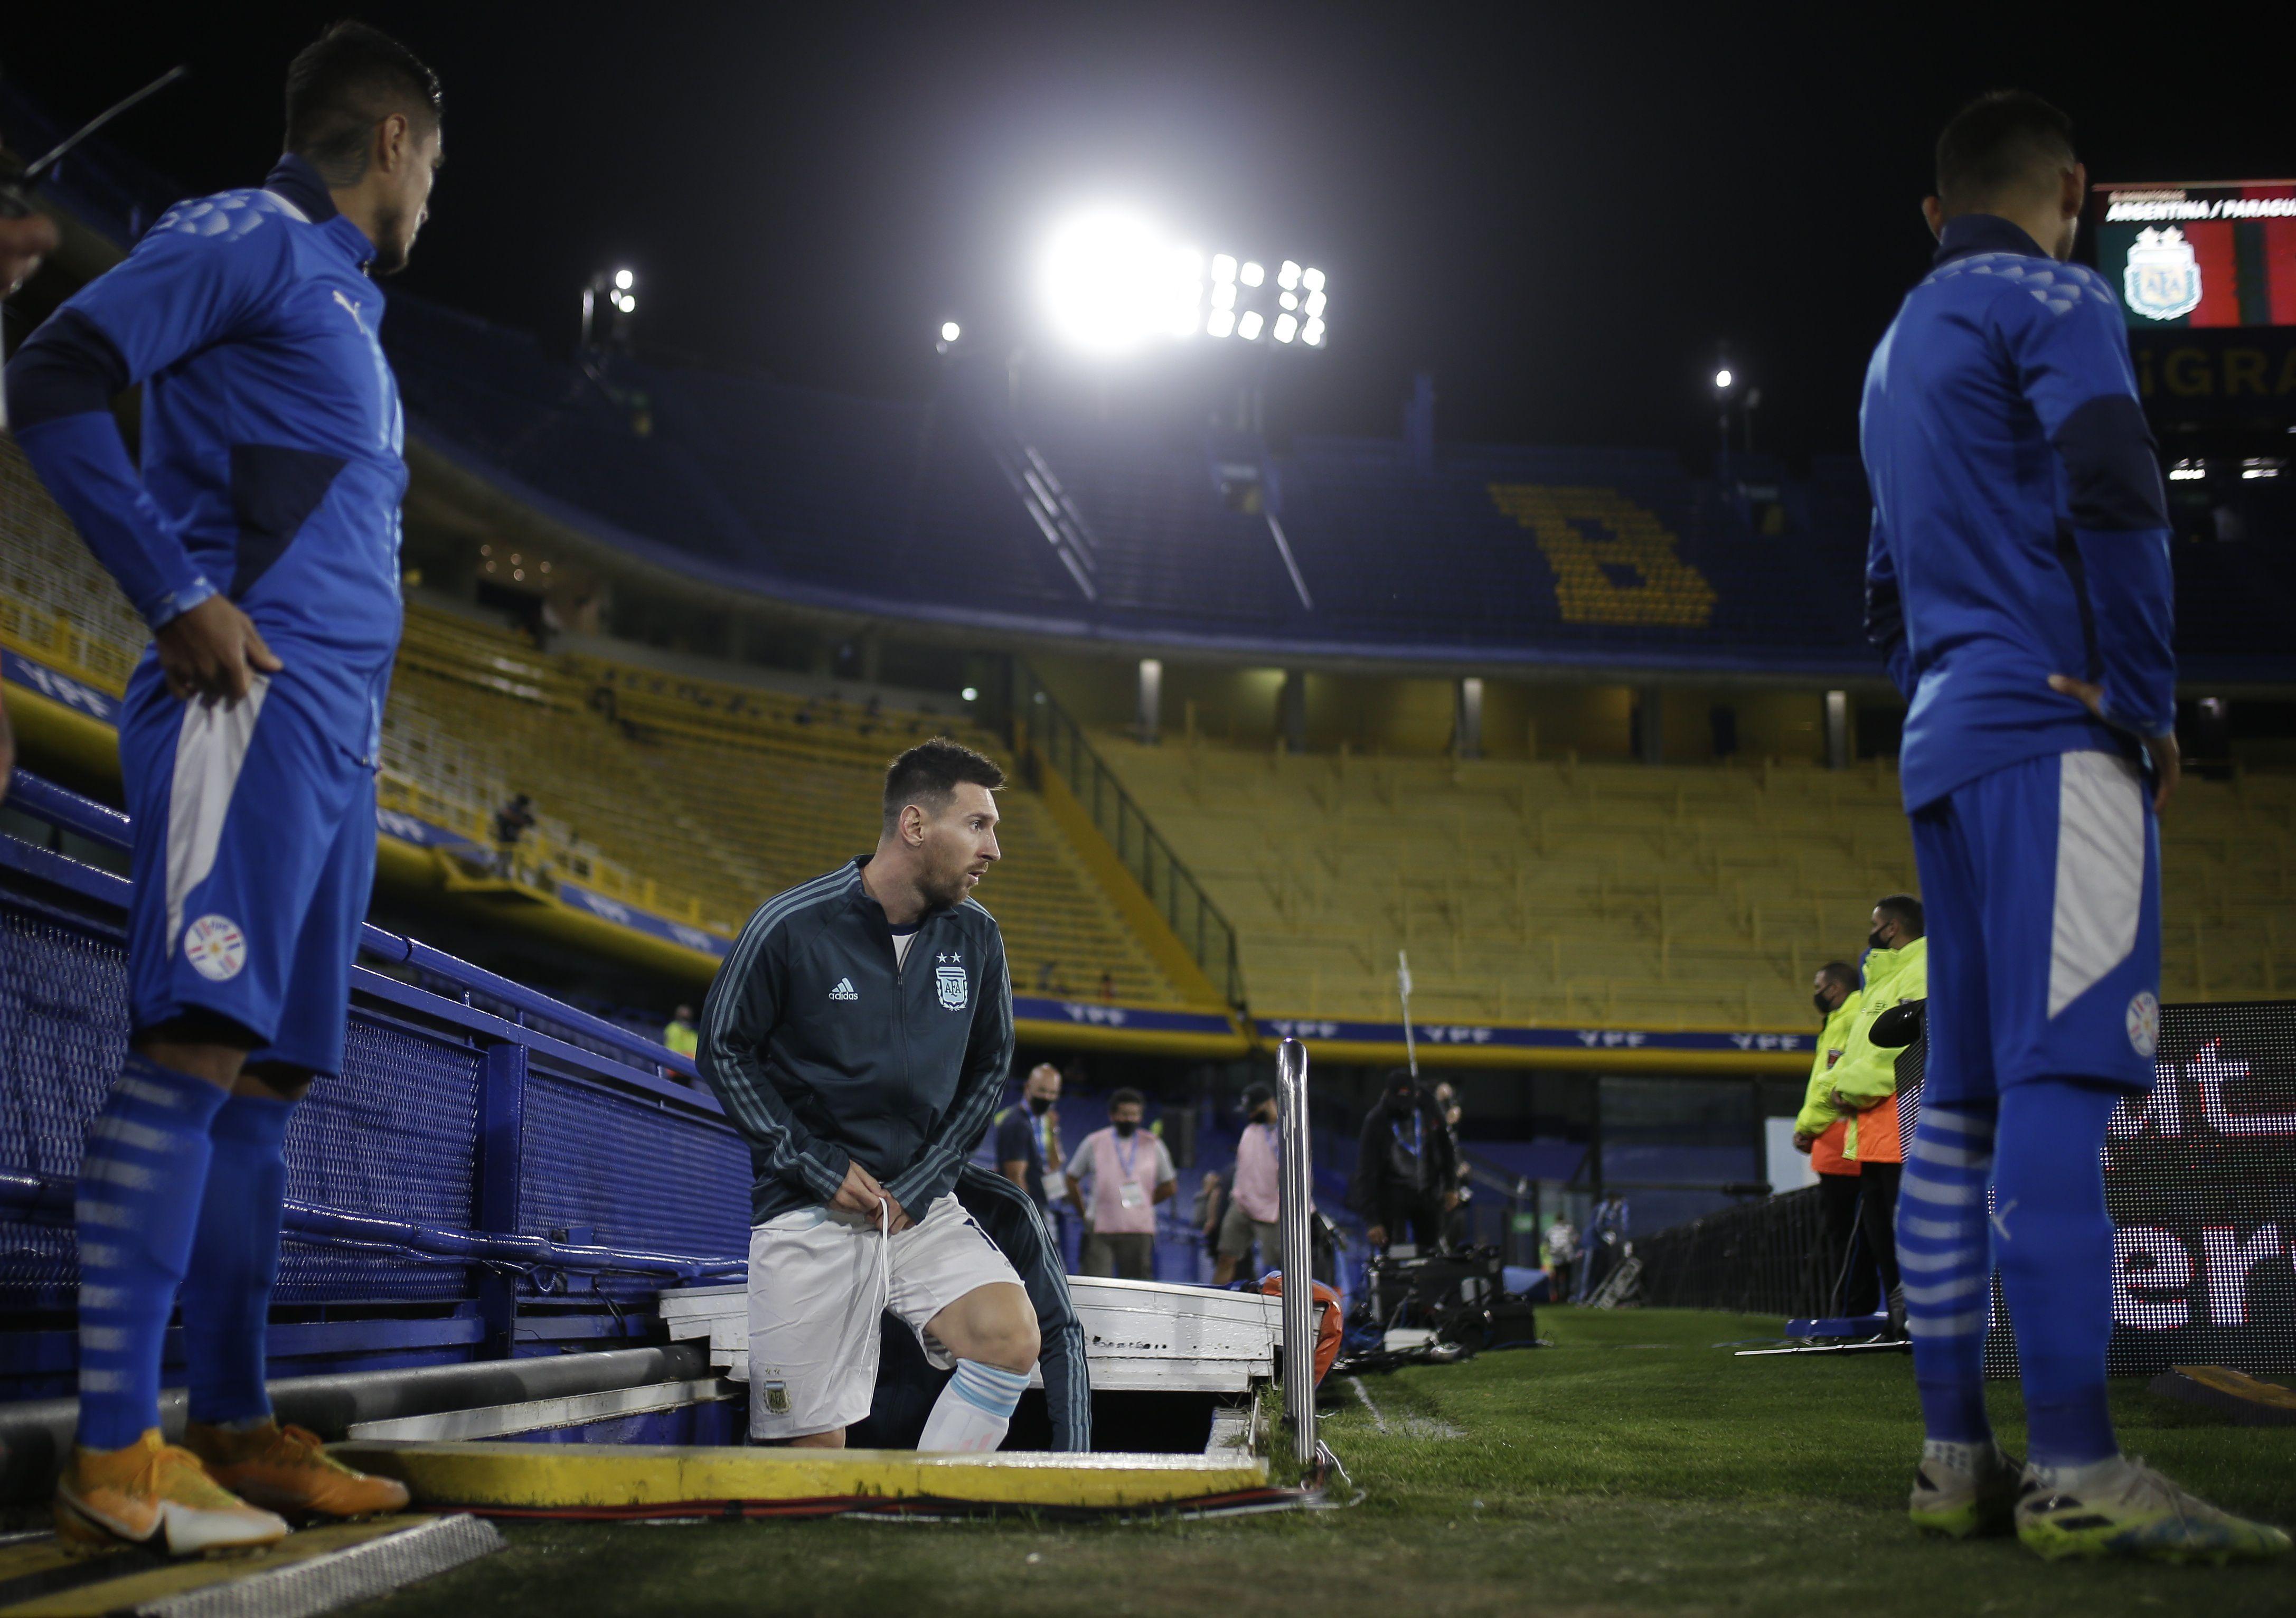 Lionel Messi lidera al equipo argentino en la salida de los protagonistas a La Bombonera. Foto: REUTERS/Juan Ignacio Roncoroni